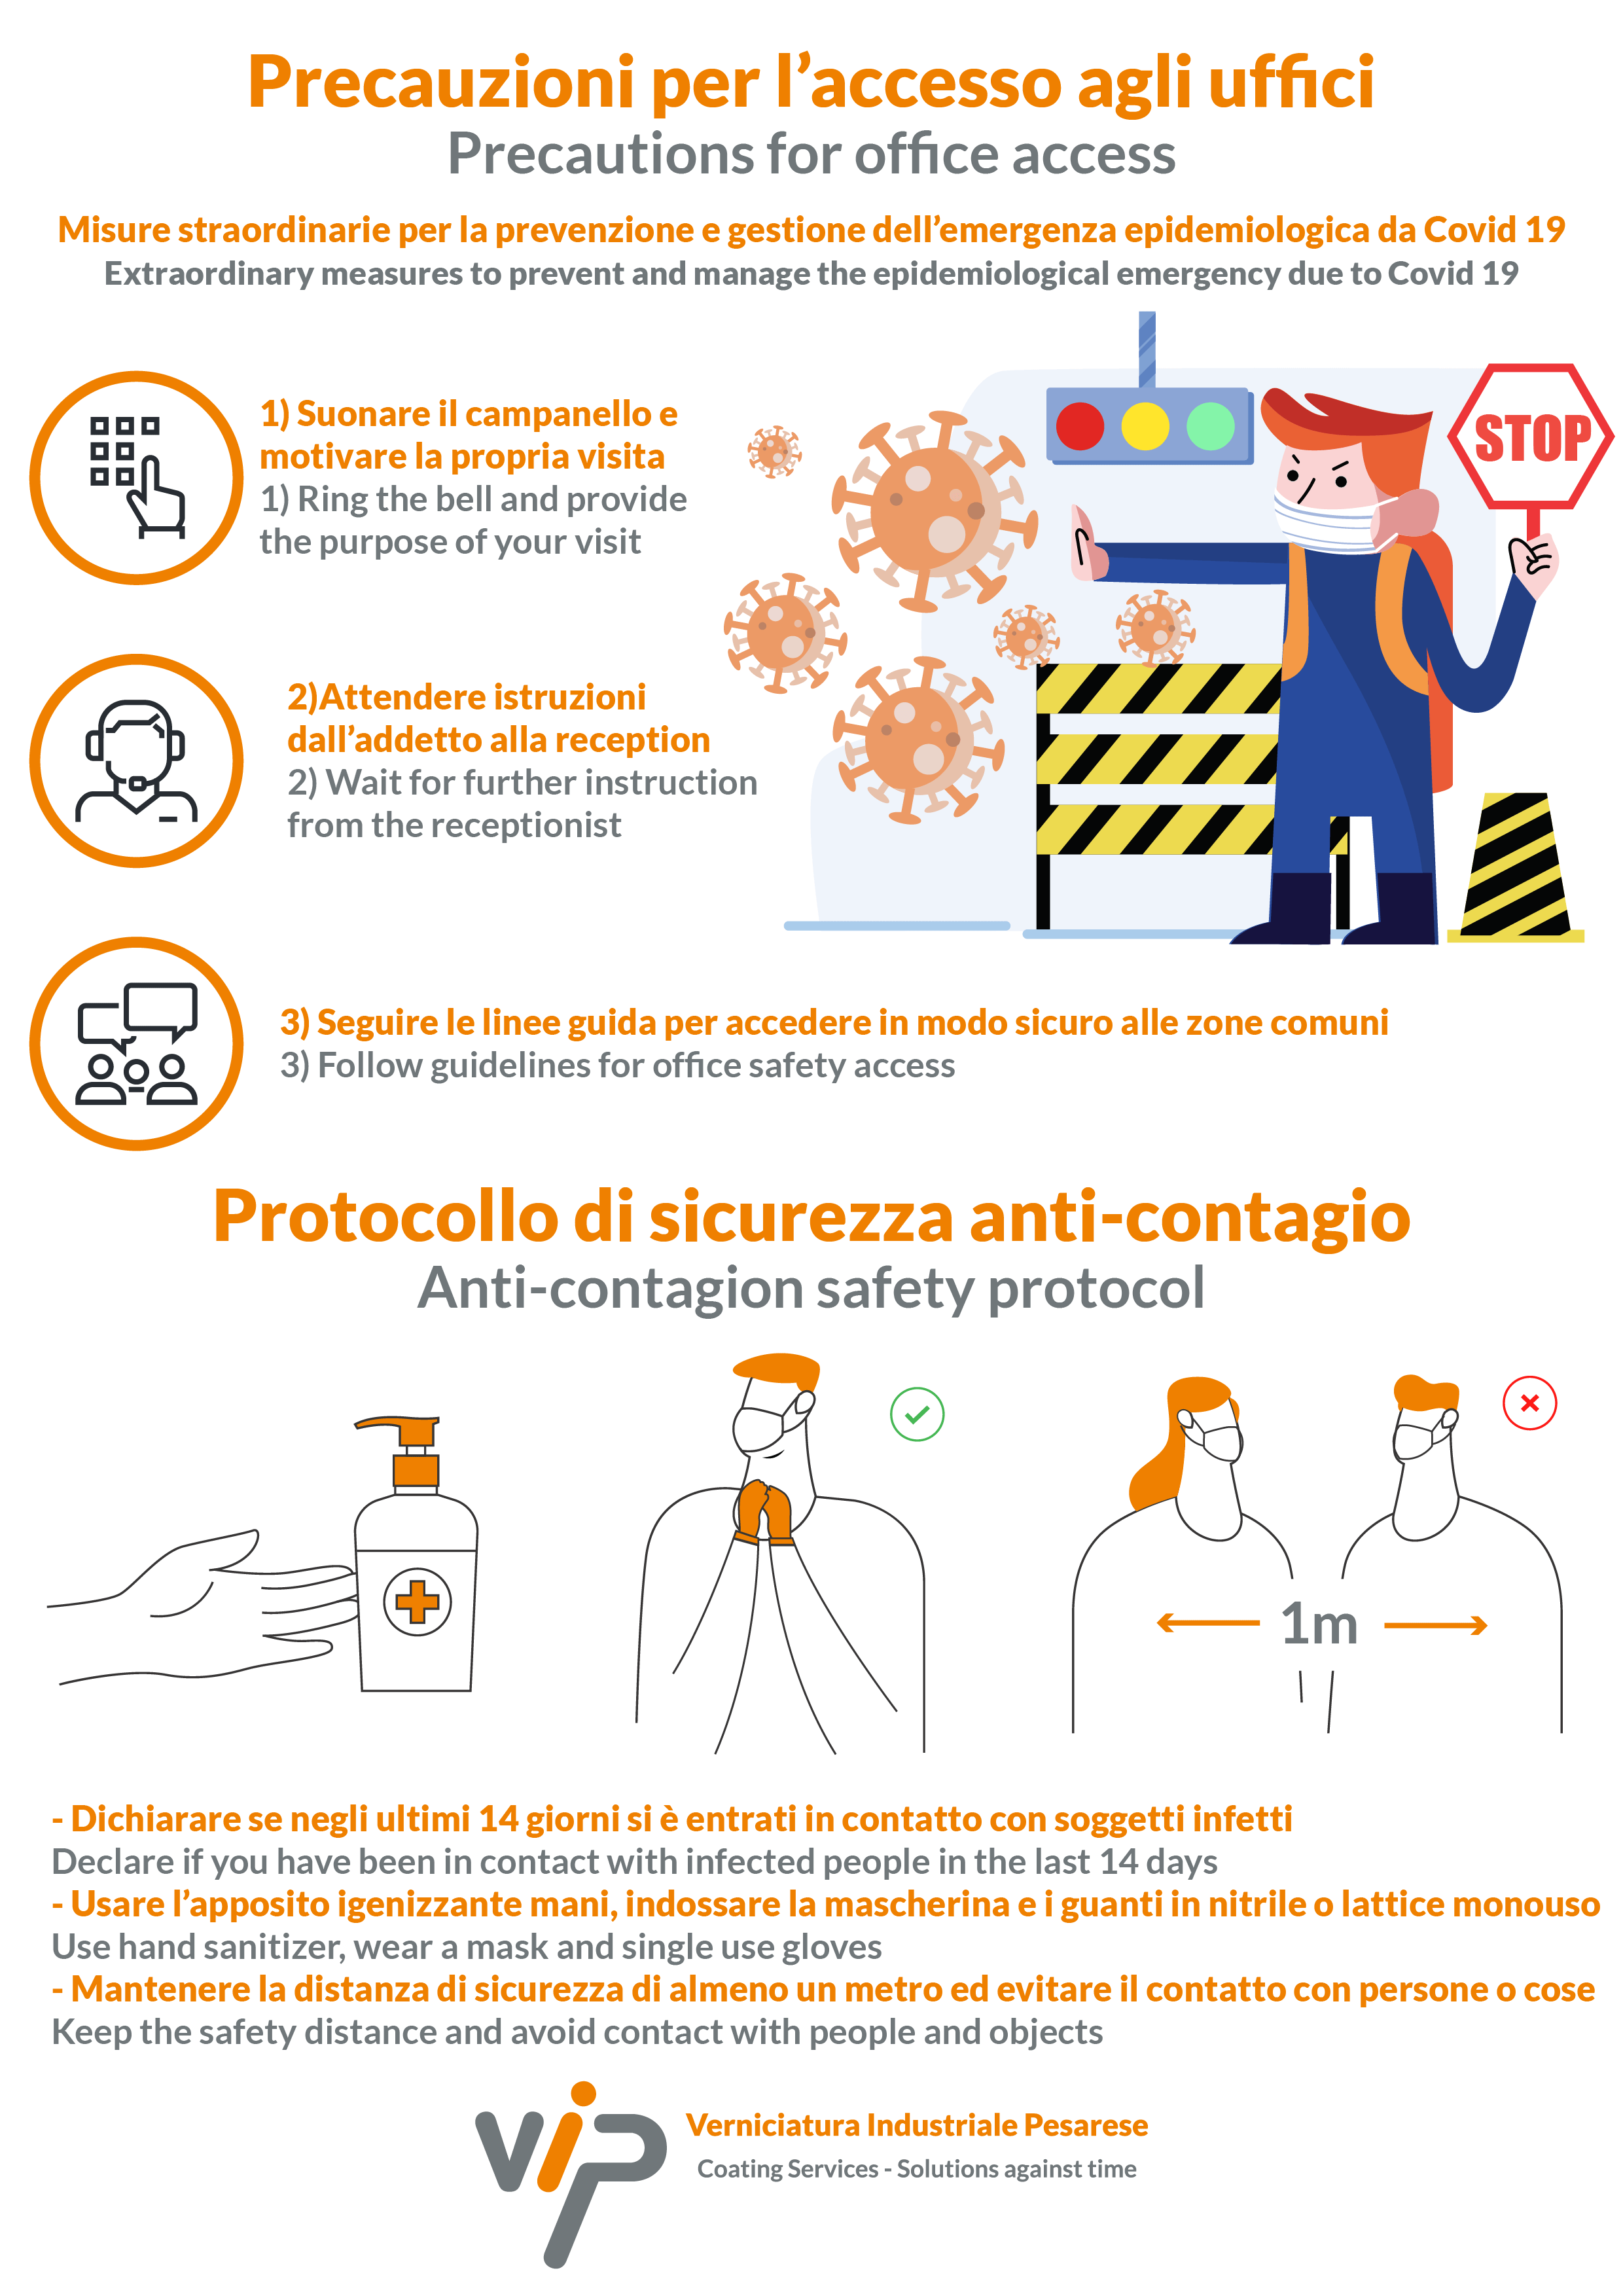 coronavirus - prevention